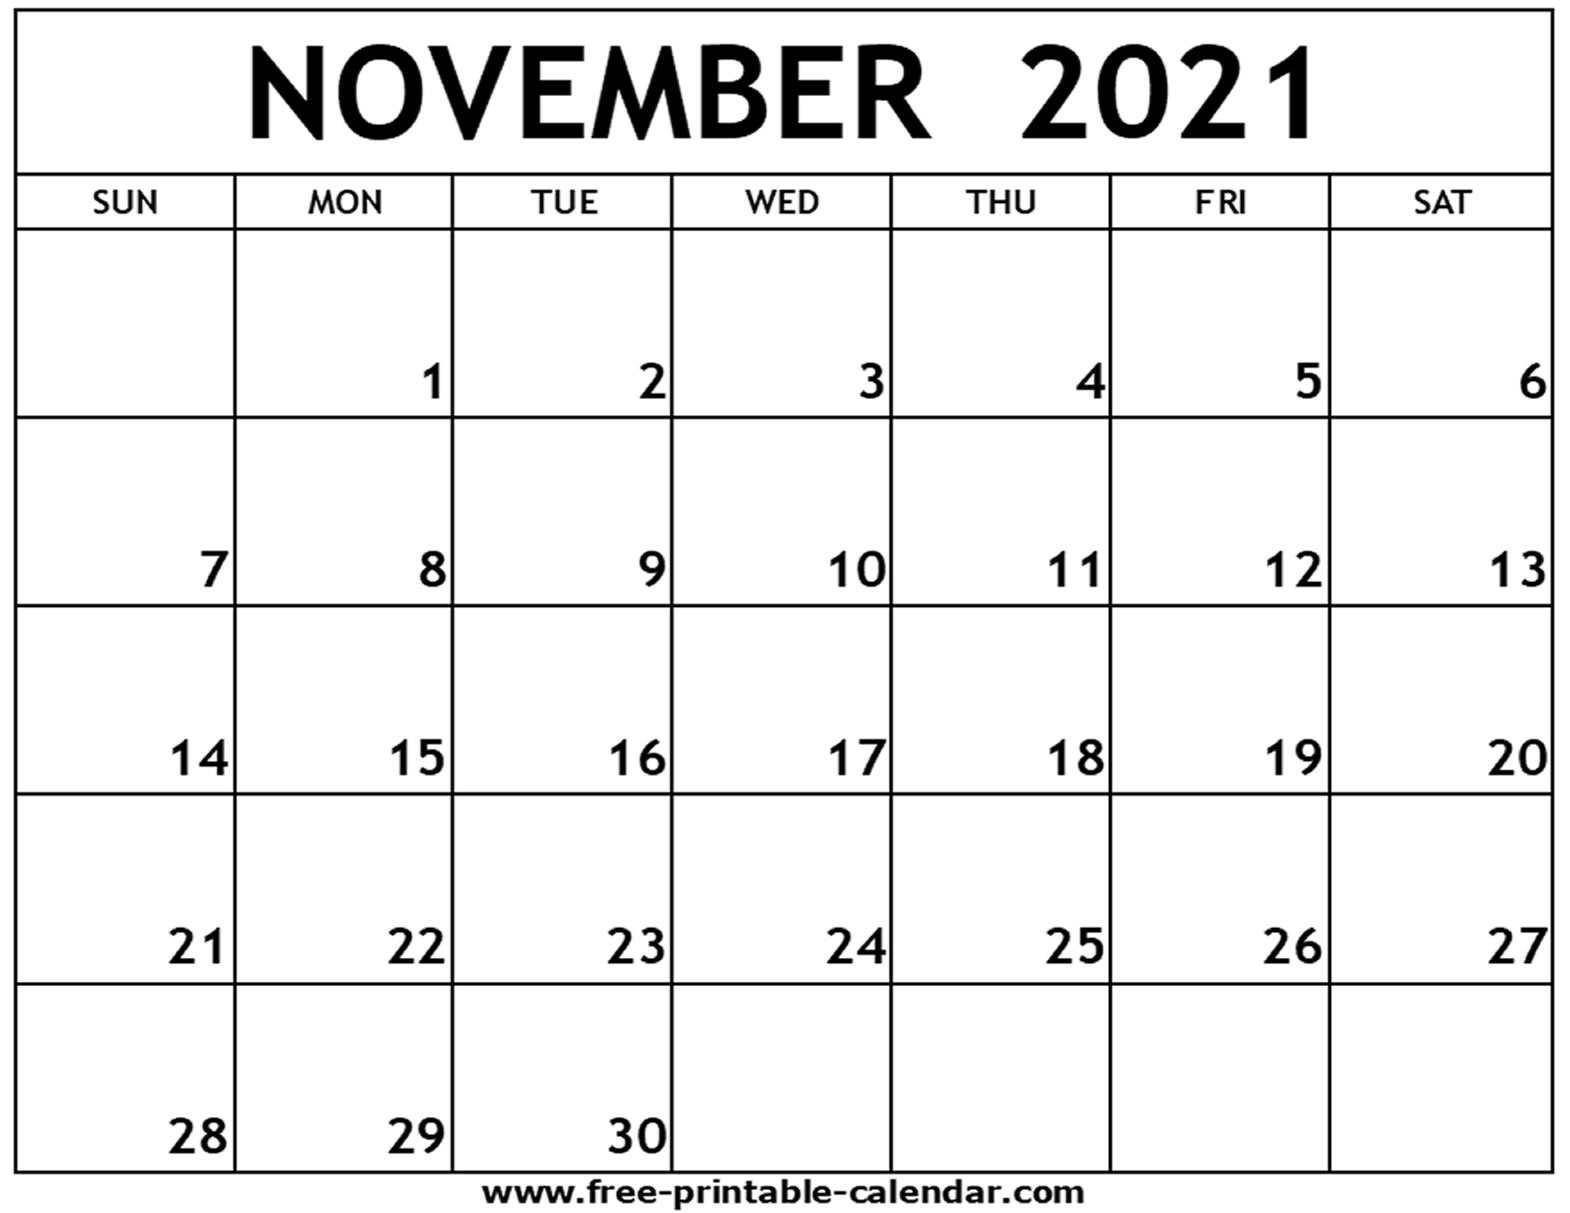 Take November 2021 Calendar